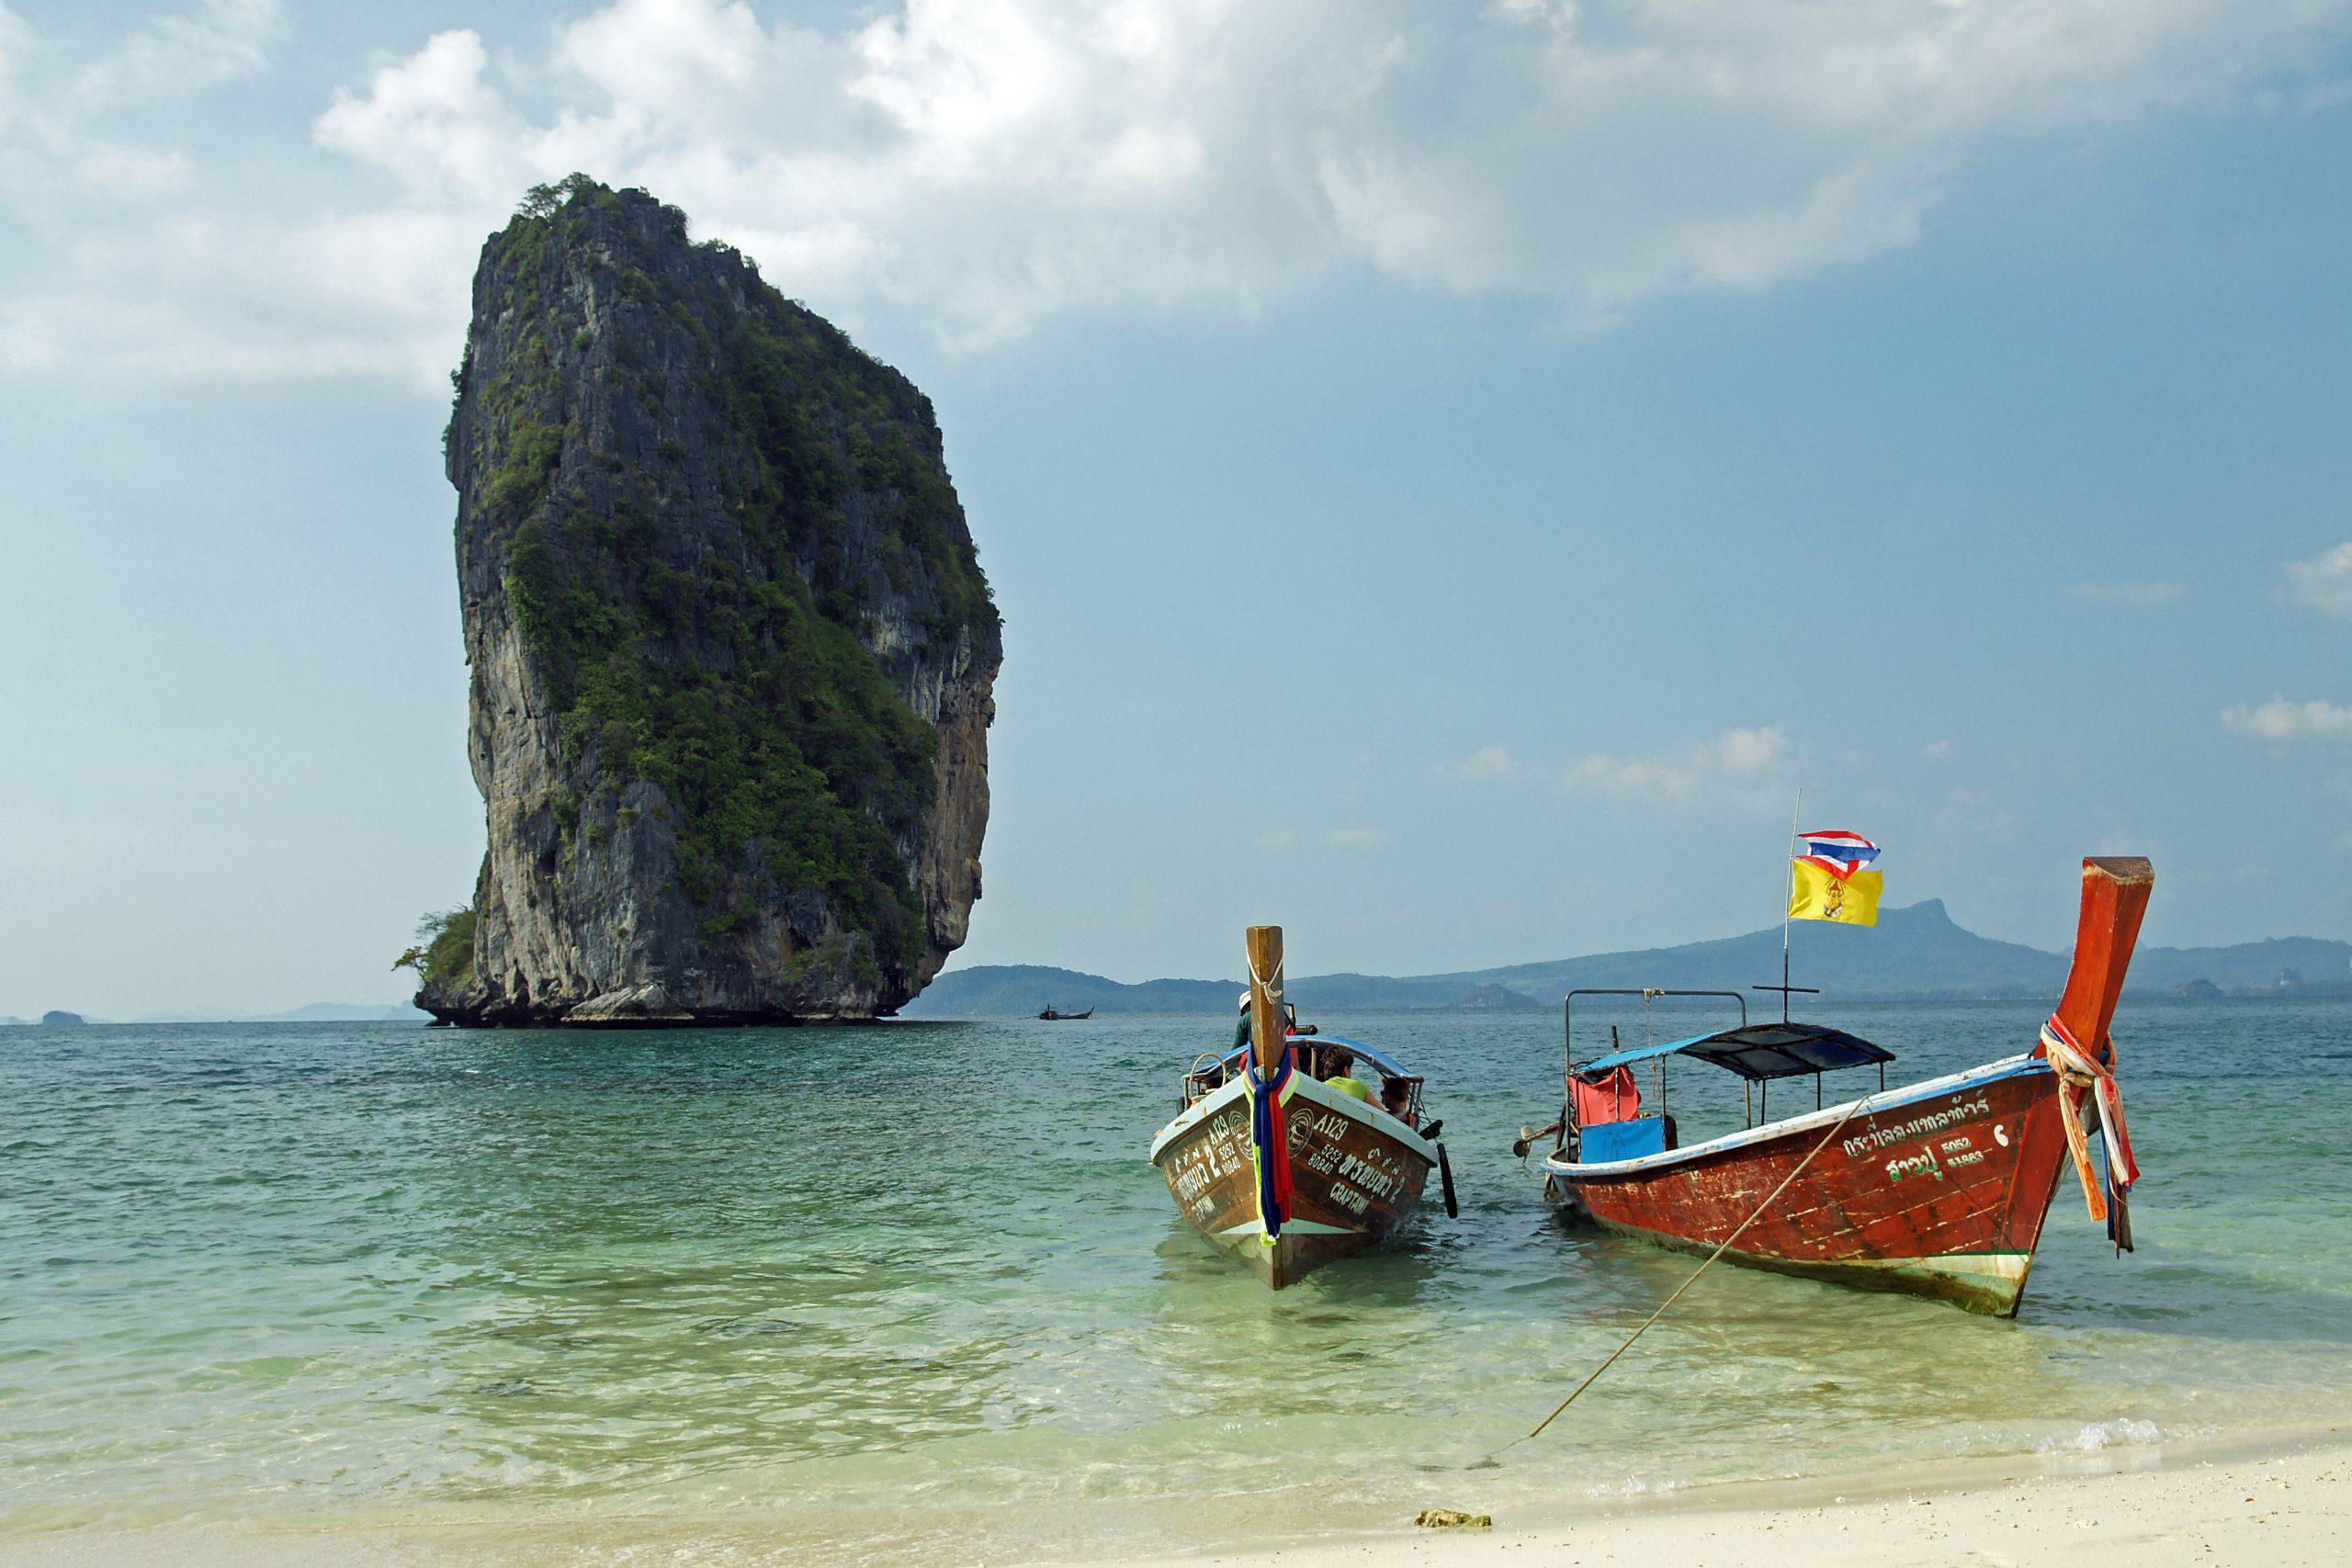 Koh Poda - Best Island Near Krabi For A Beach Vacation This Summer